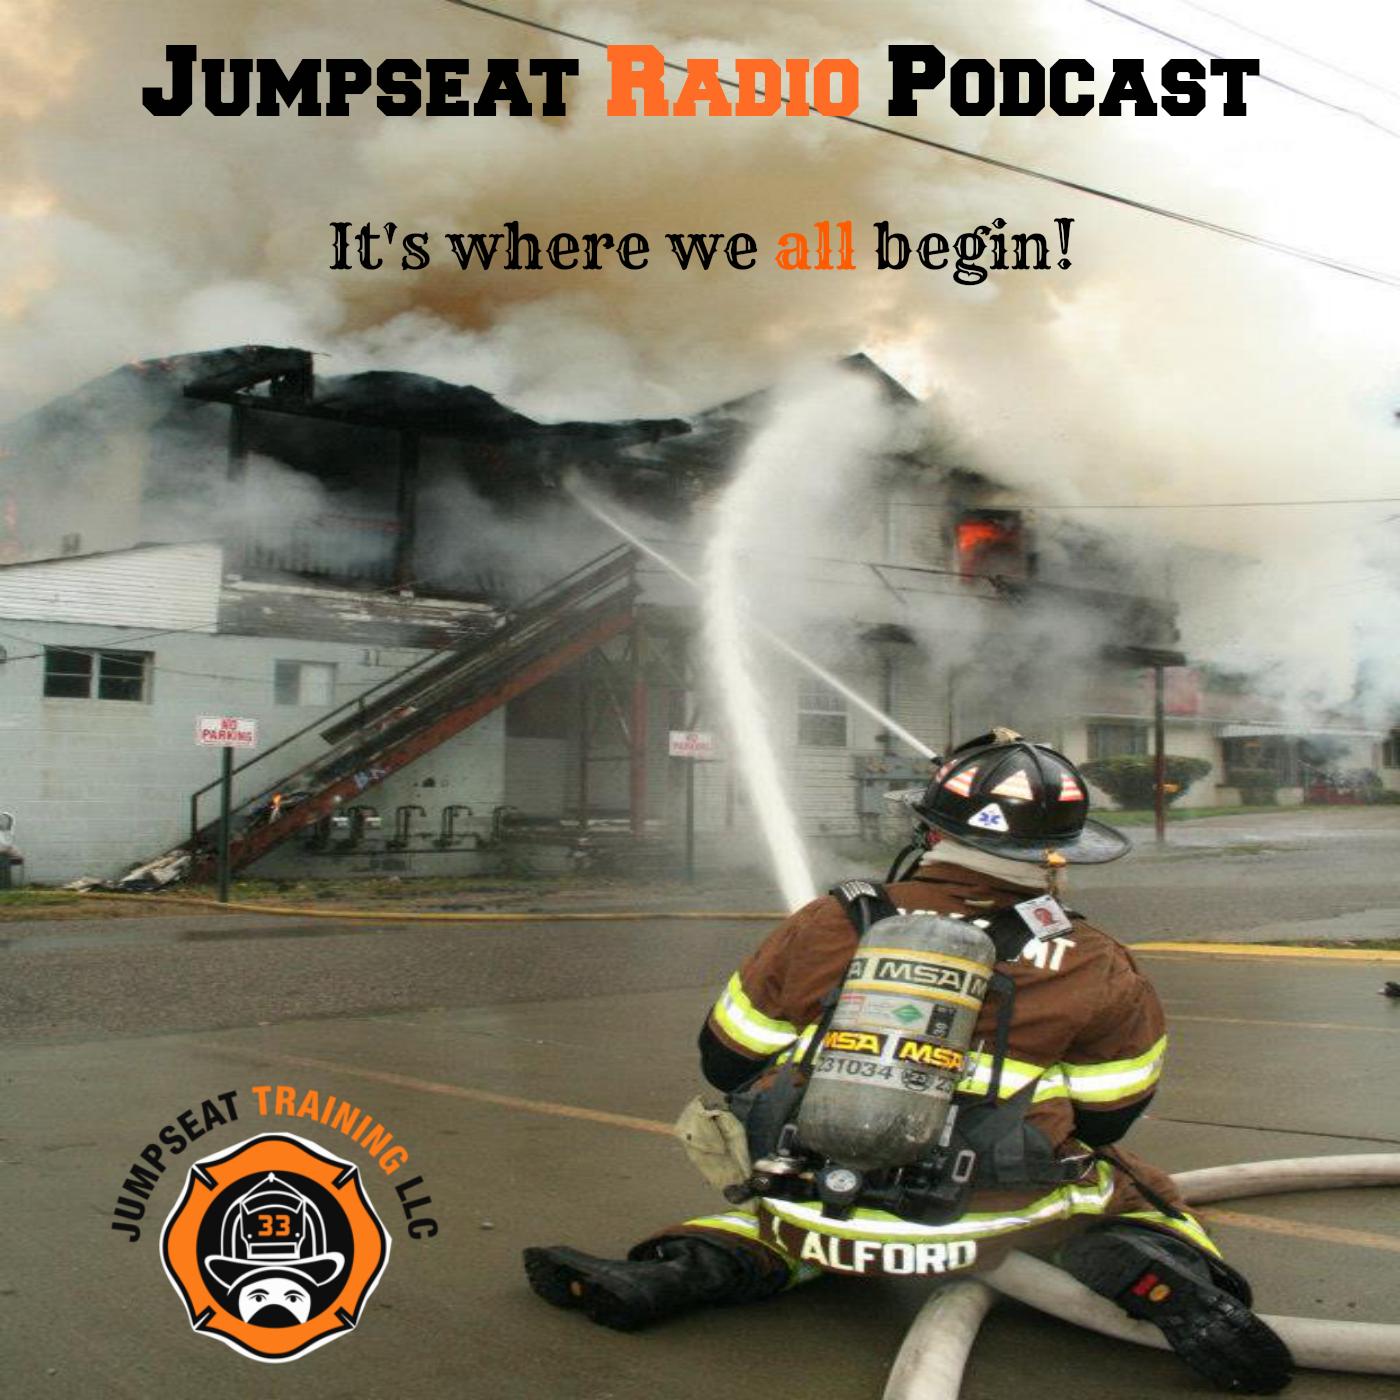 JumpseatRadio show art